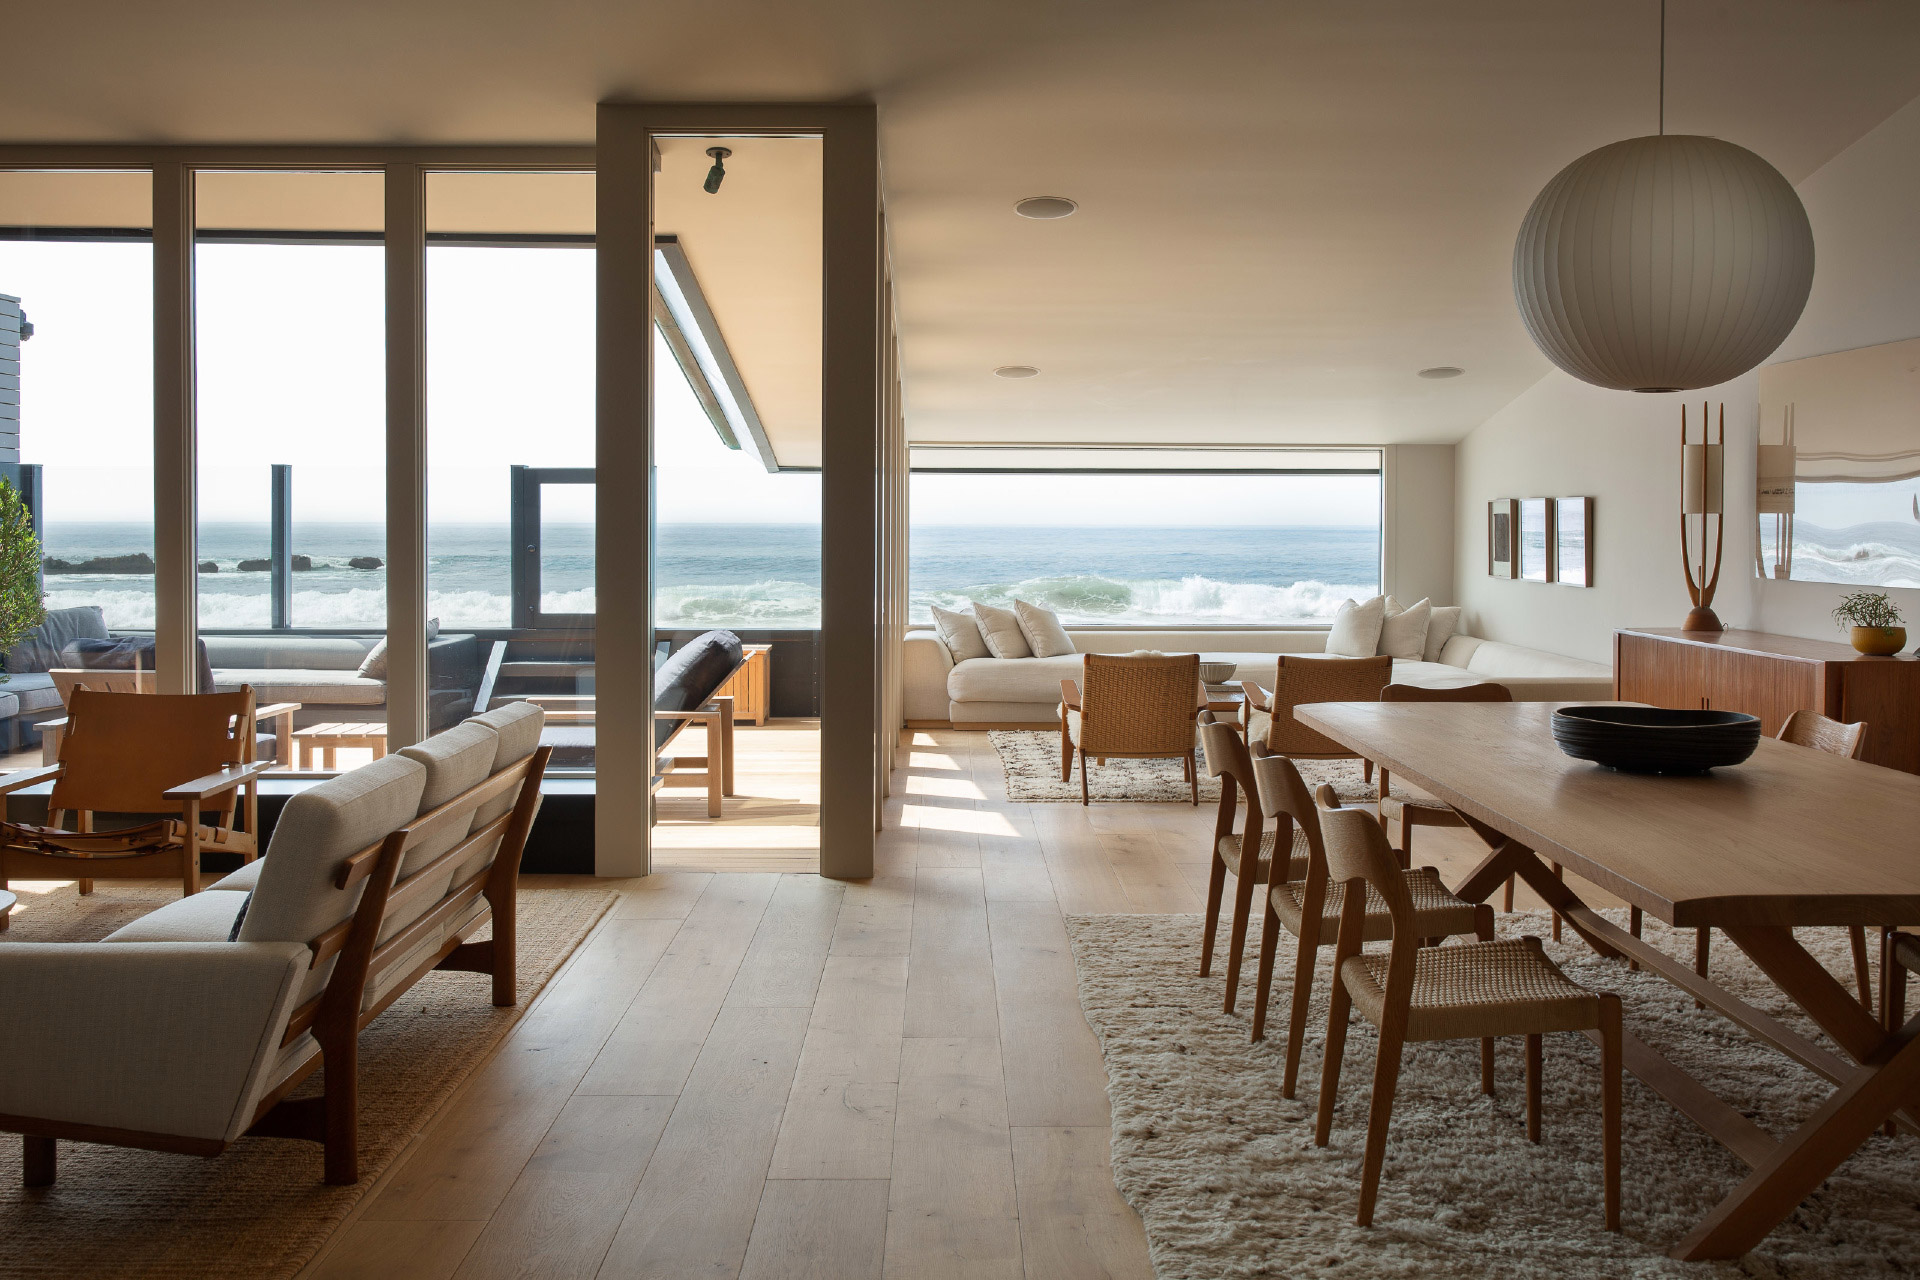 Ein Blick in Jason Stathams Strandhaus in Malibu, Kalifornien 1